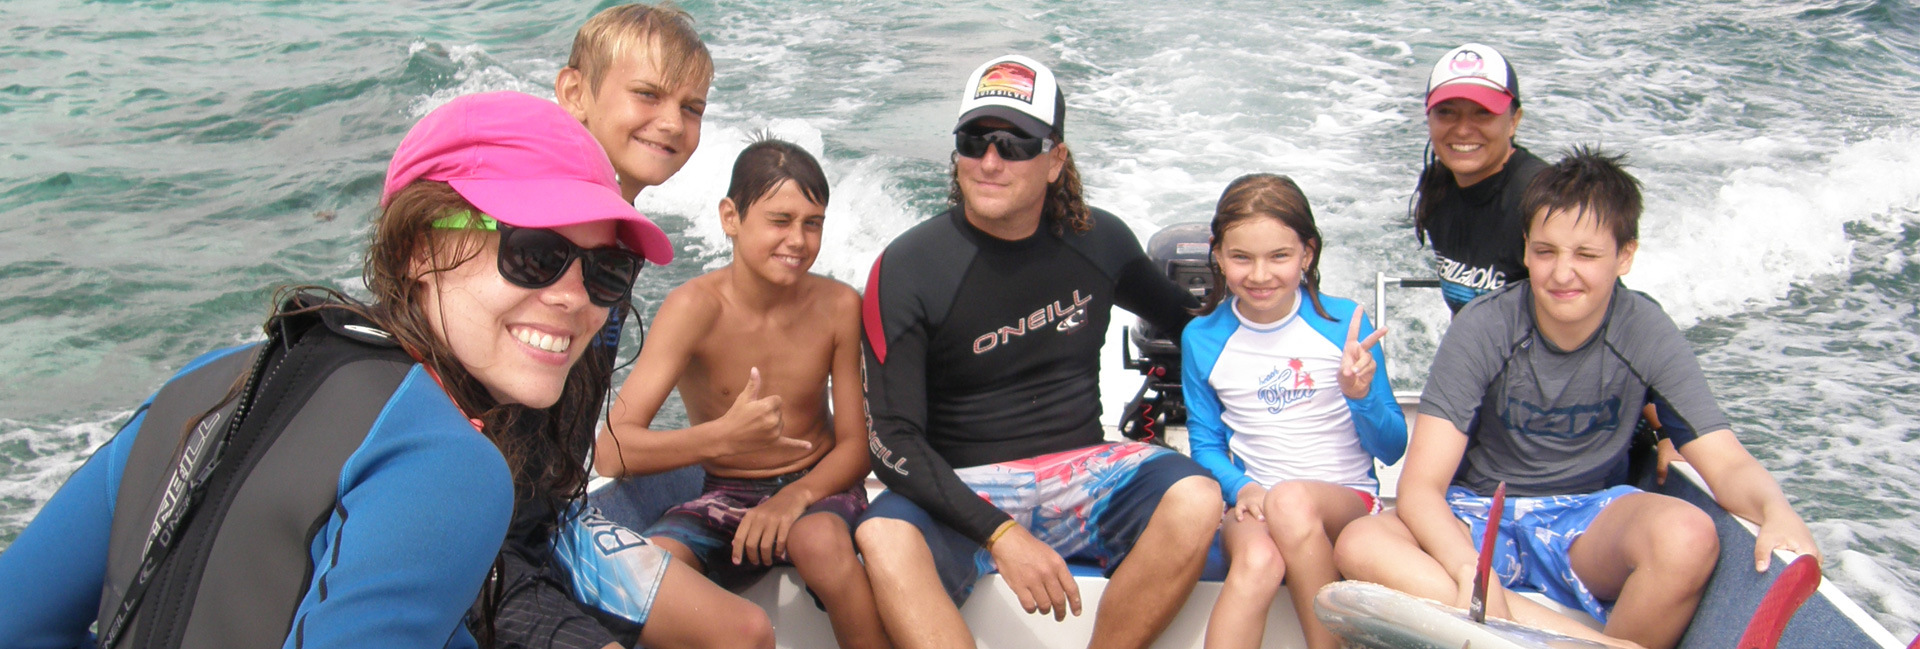 surf-lesson-le-morne-mauritius